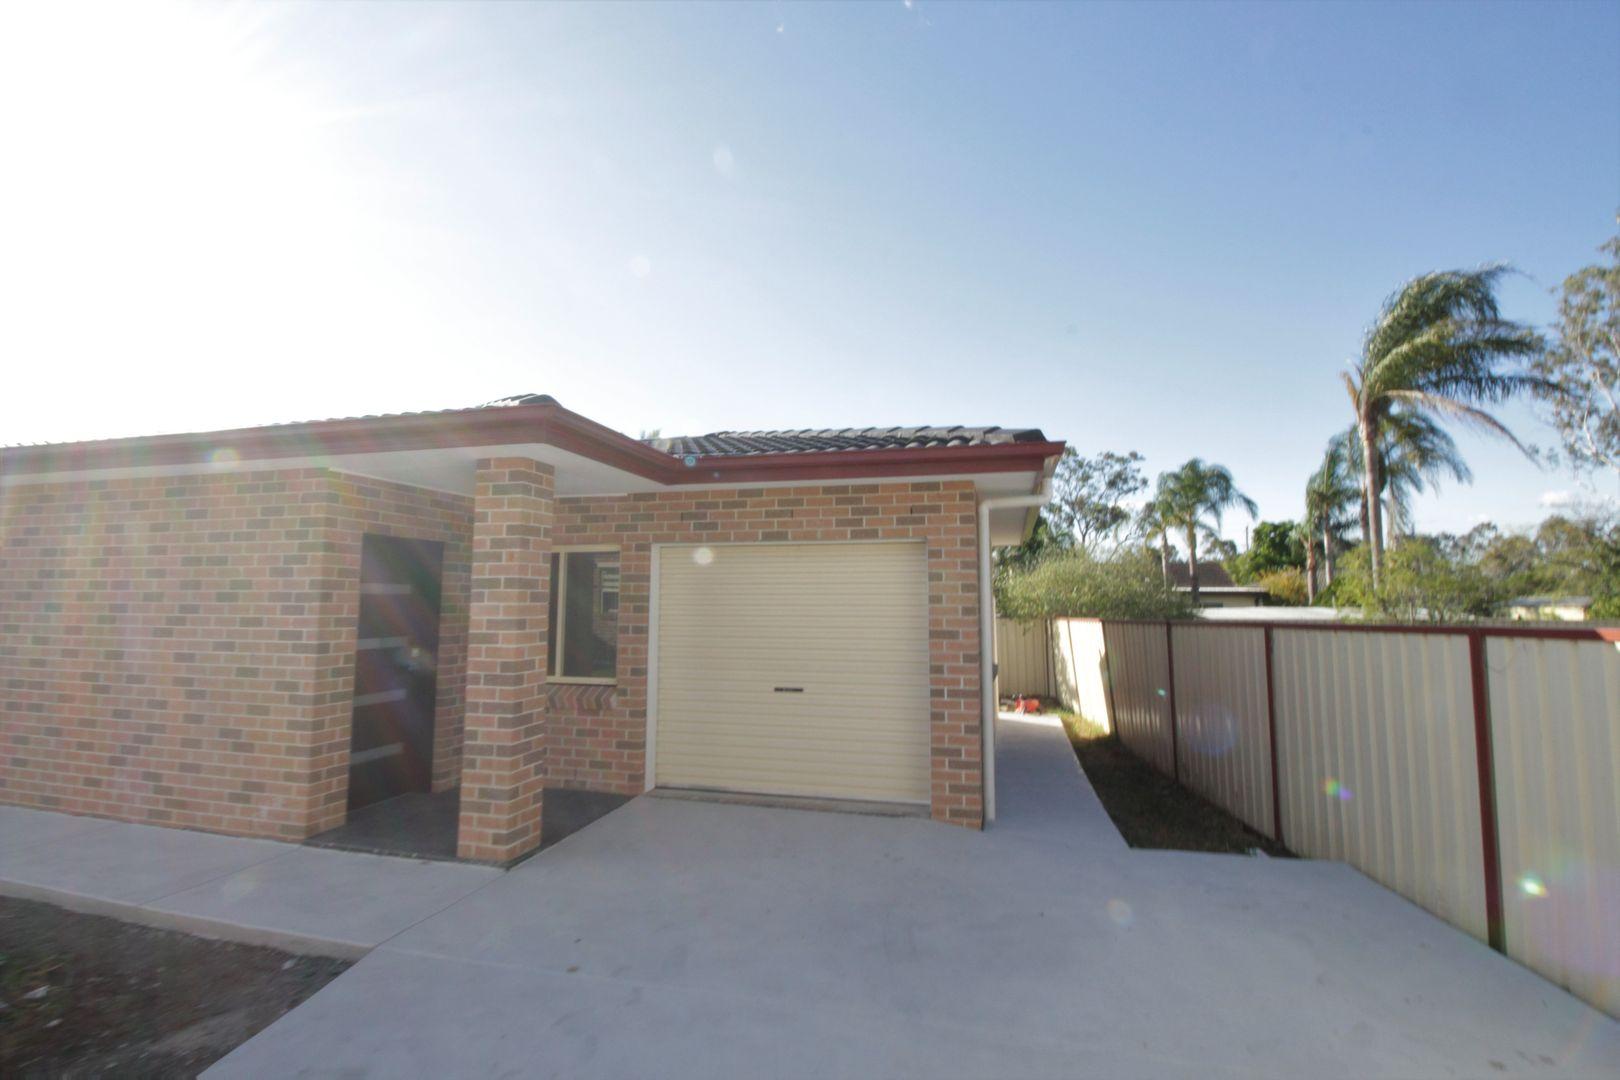 9A Waratah Avenue, Casula NSW 2170, Image 0